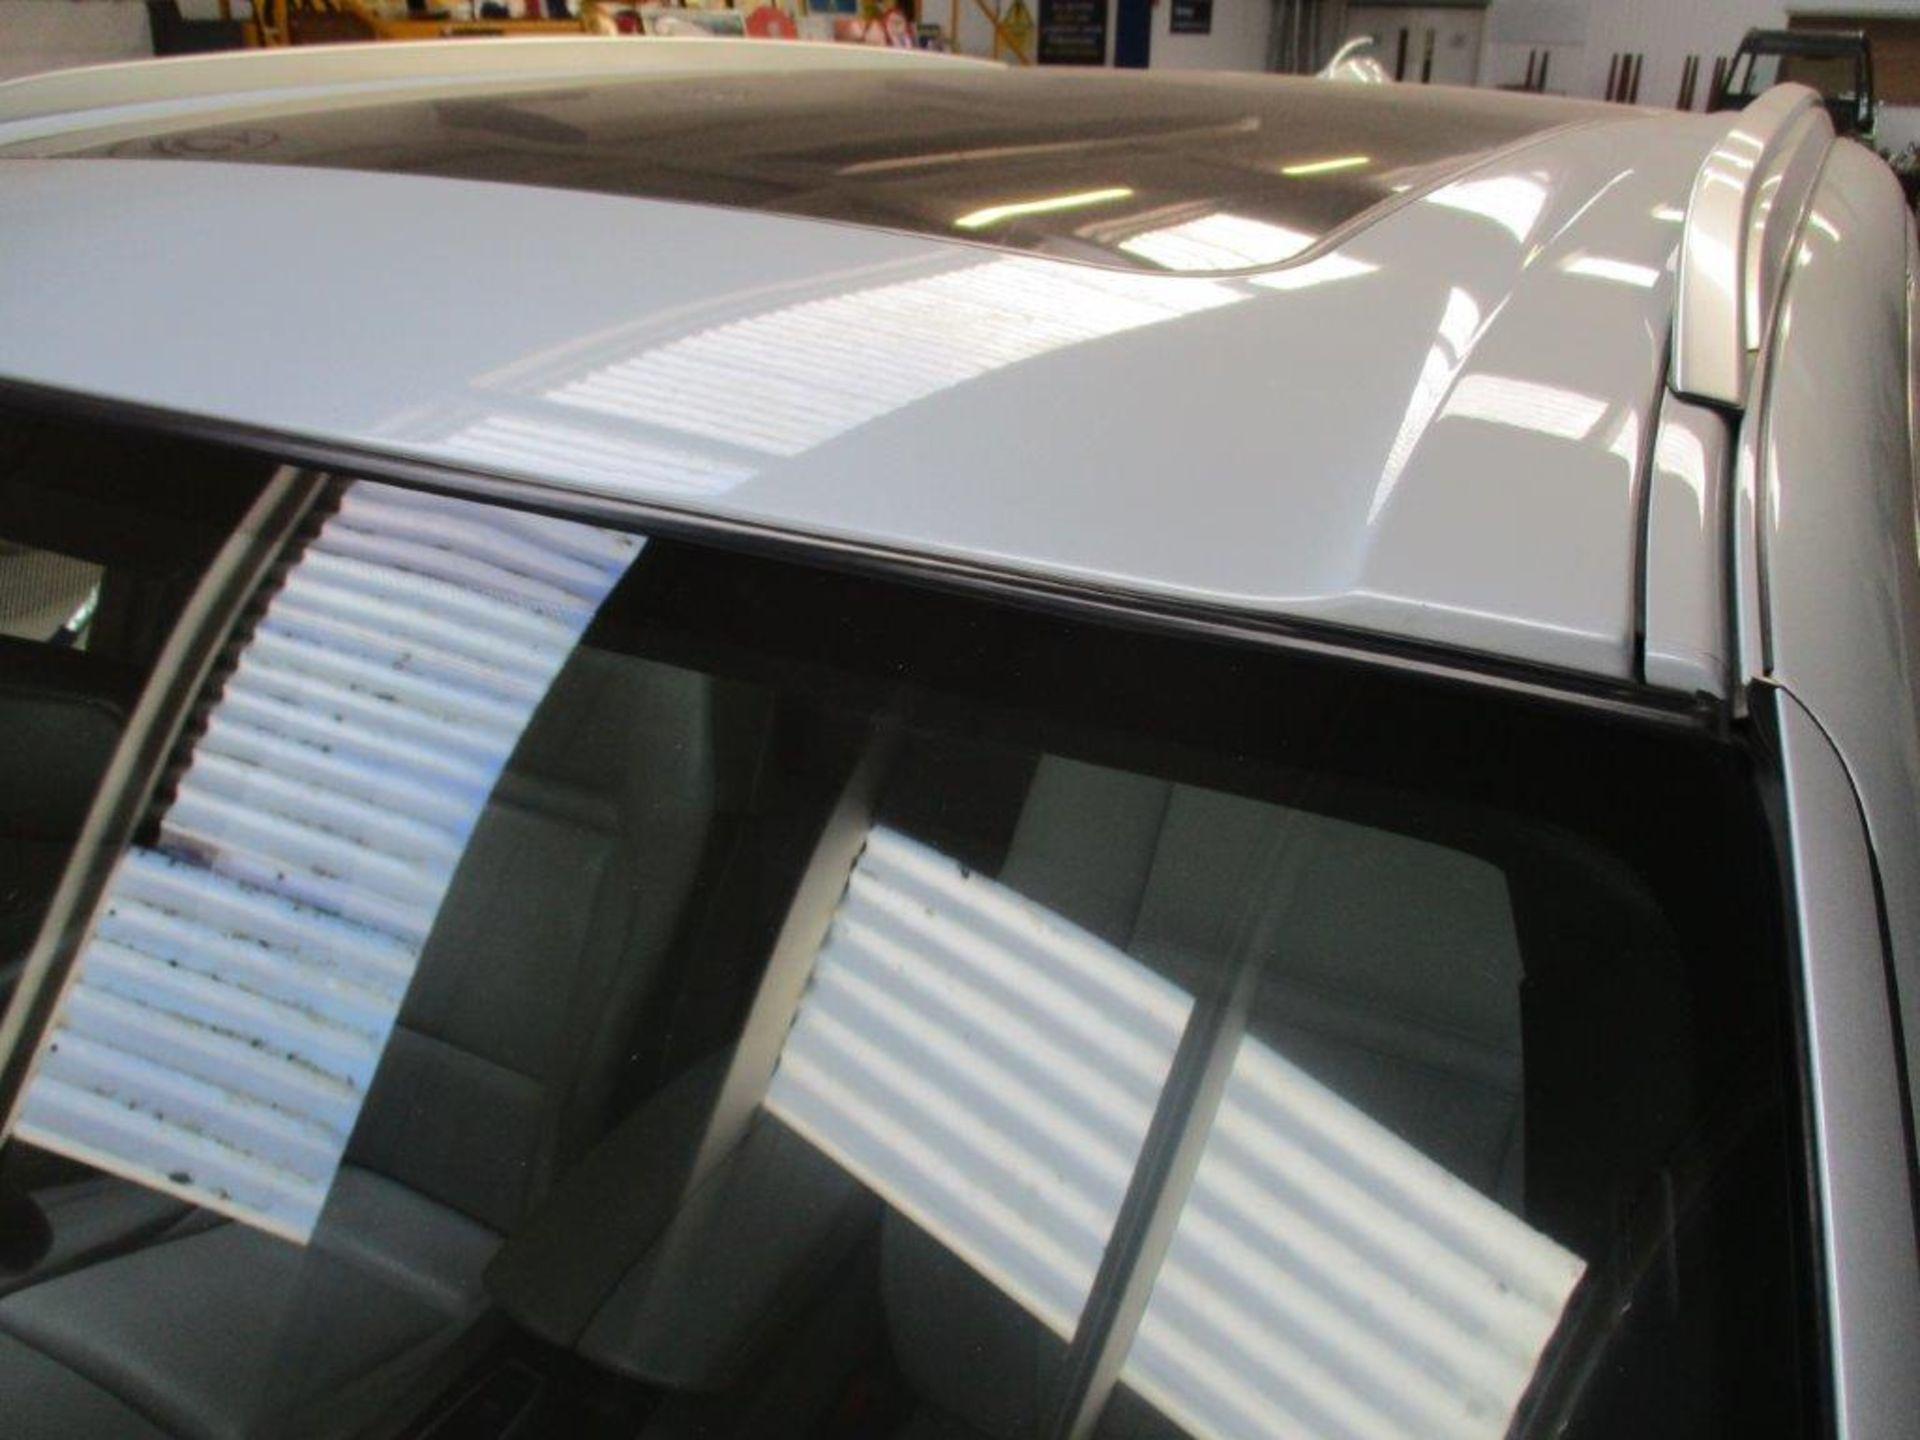 60 10 BMW X5 M Turbo Auto - Image 13 of 35